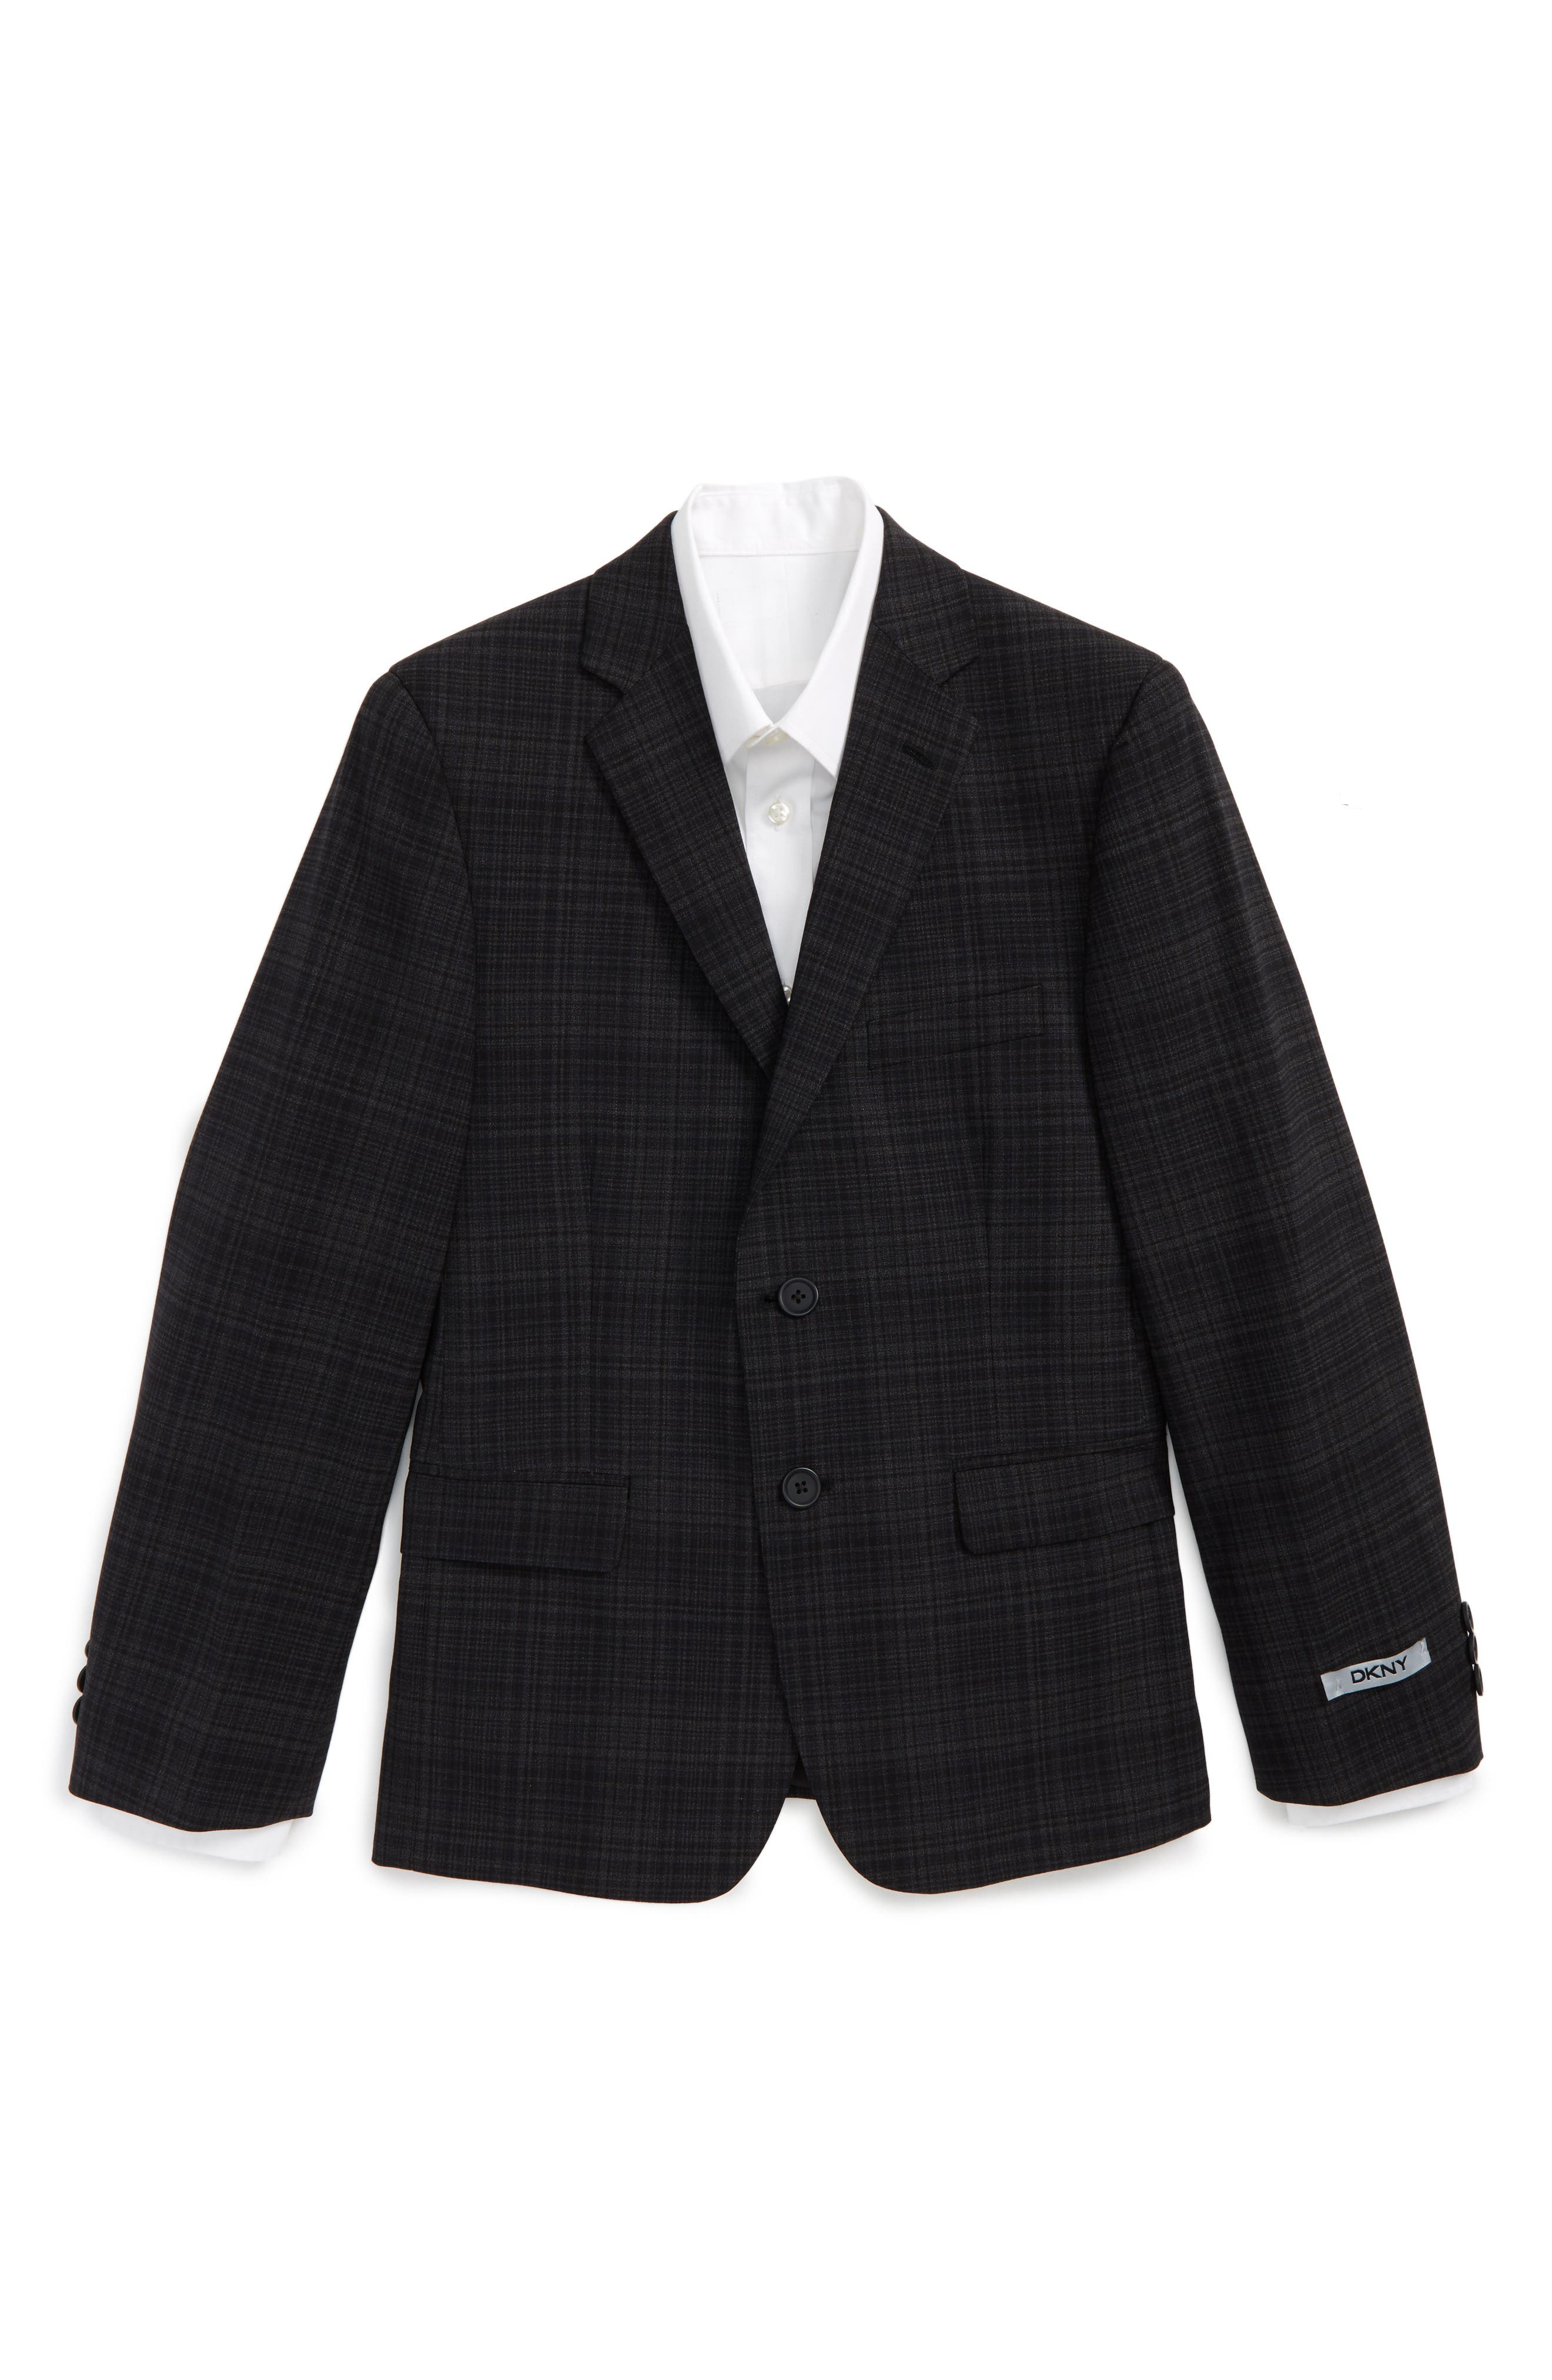 Alternate Image 1 Selected - DKNY Neat Plaid Sport Coat (Big Boys)